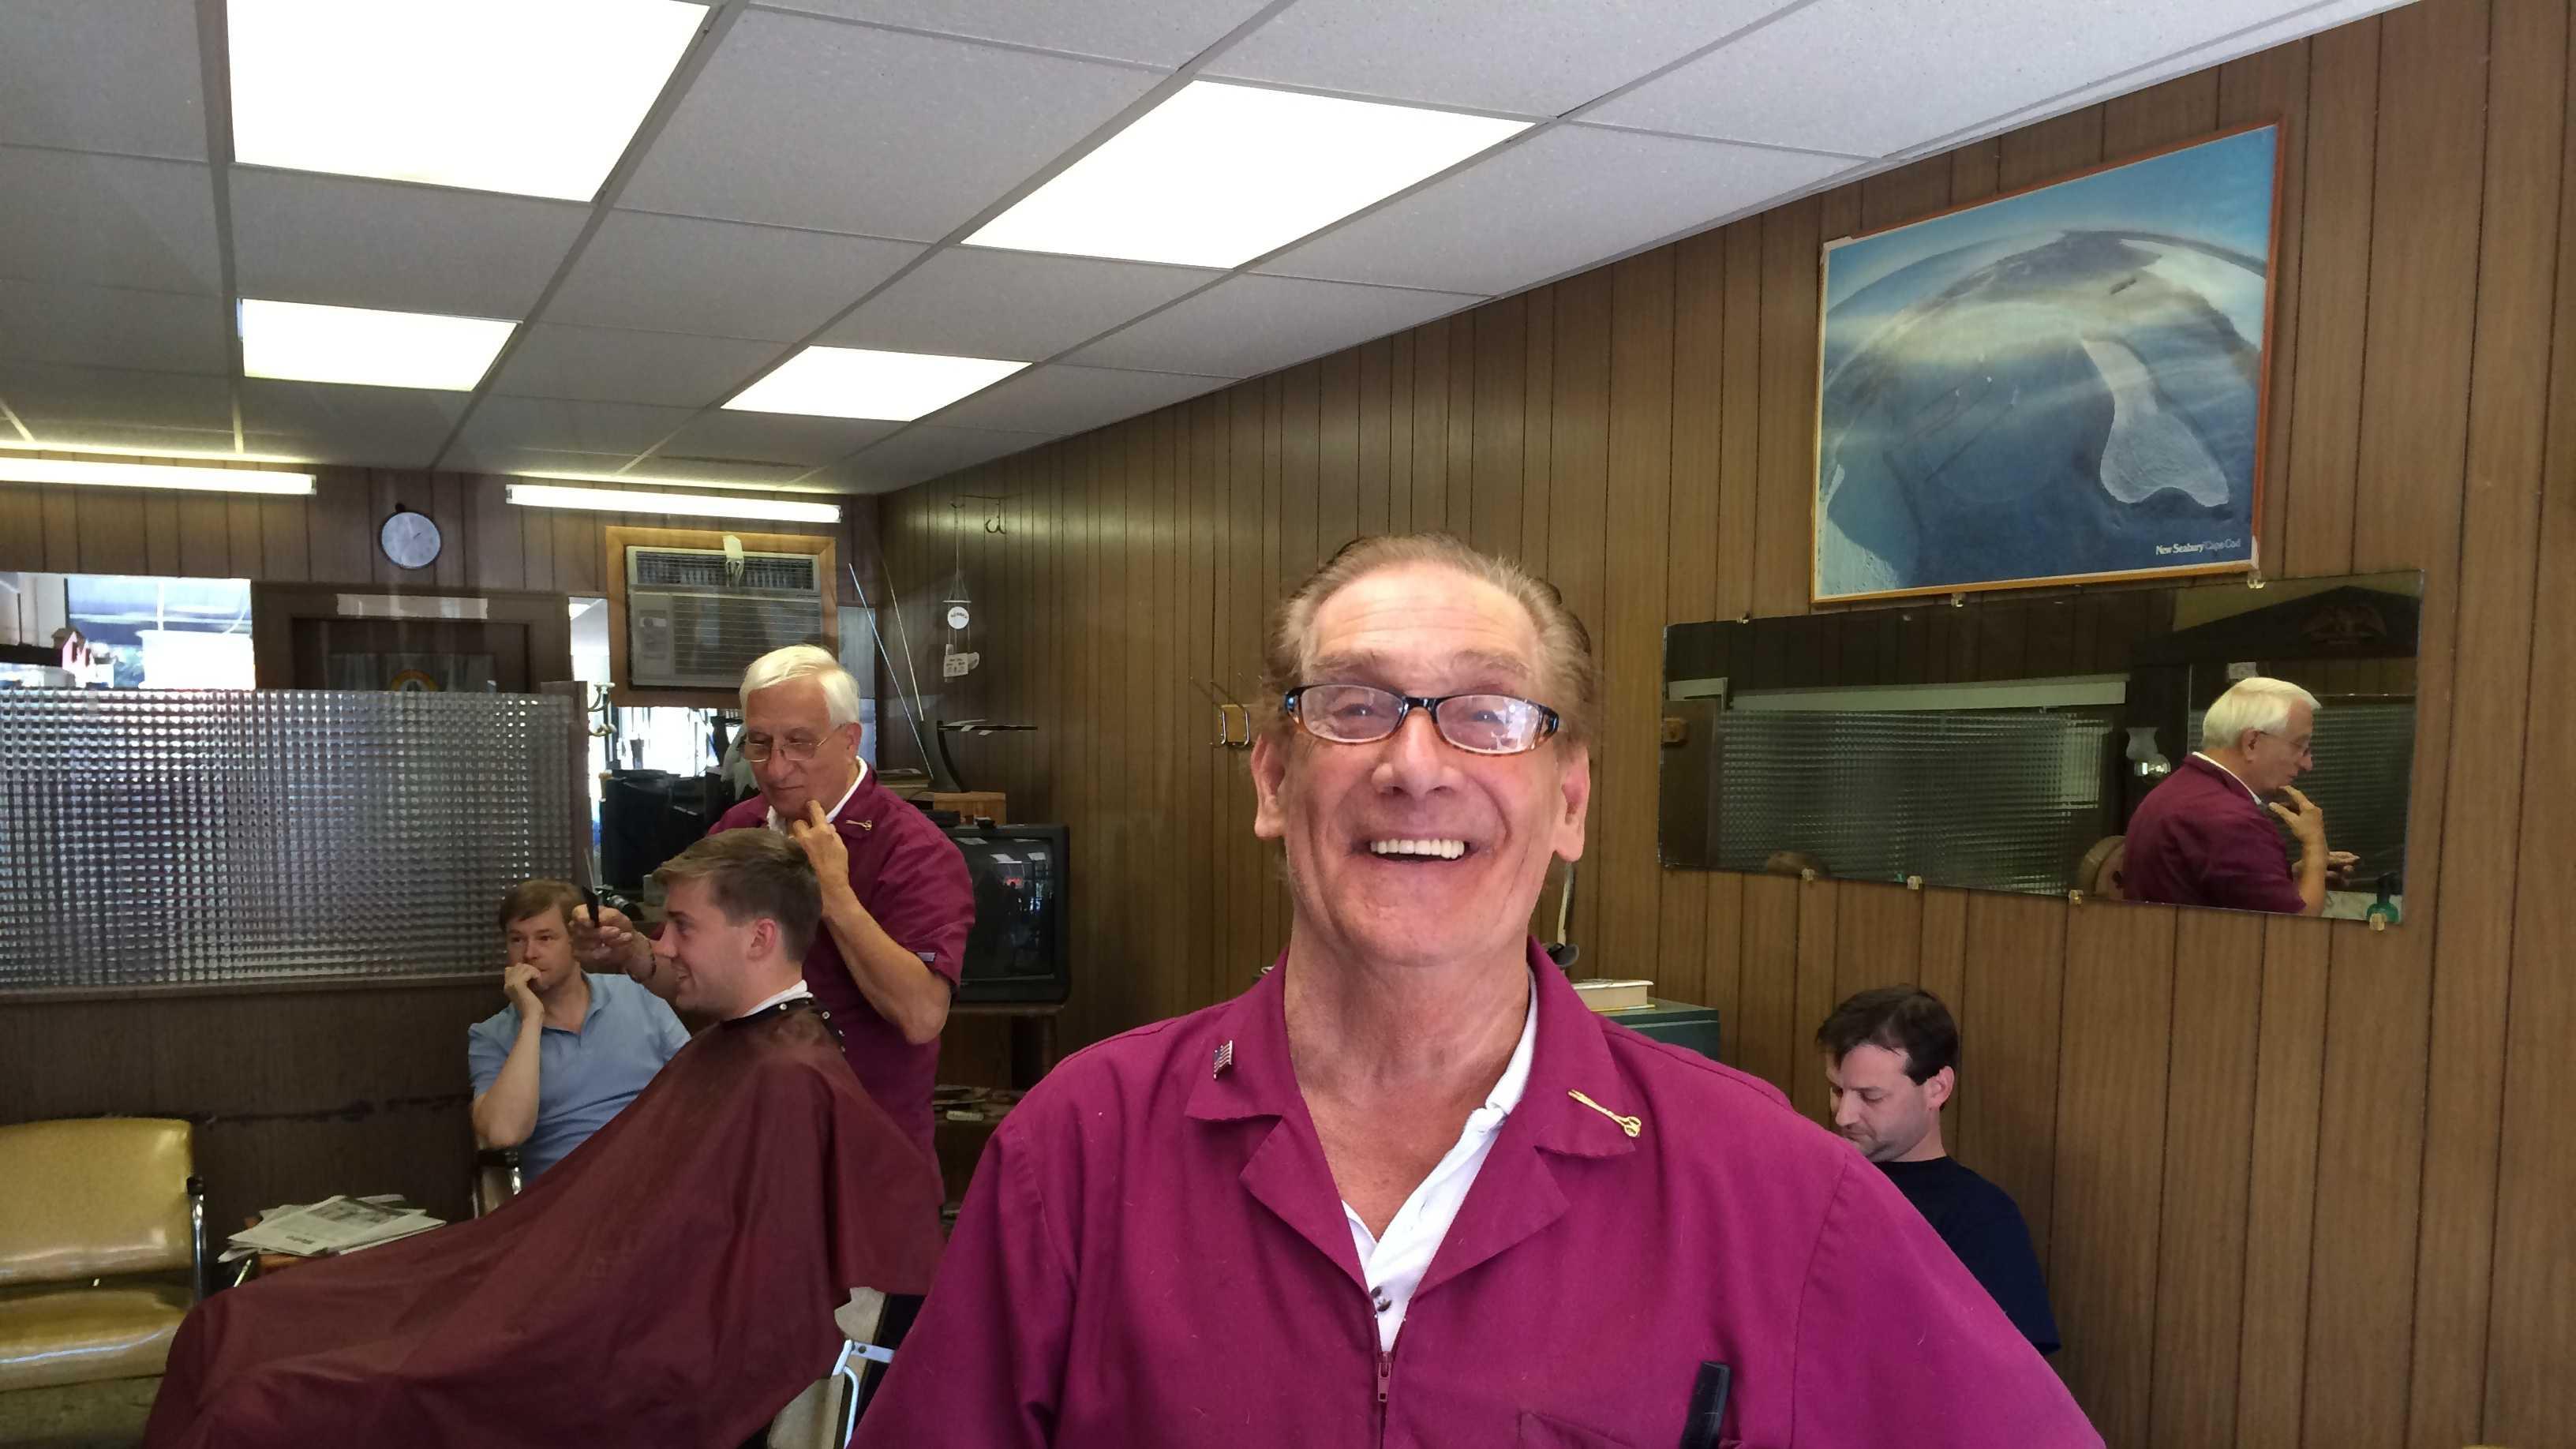 Frank the Barber